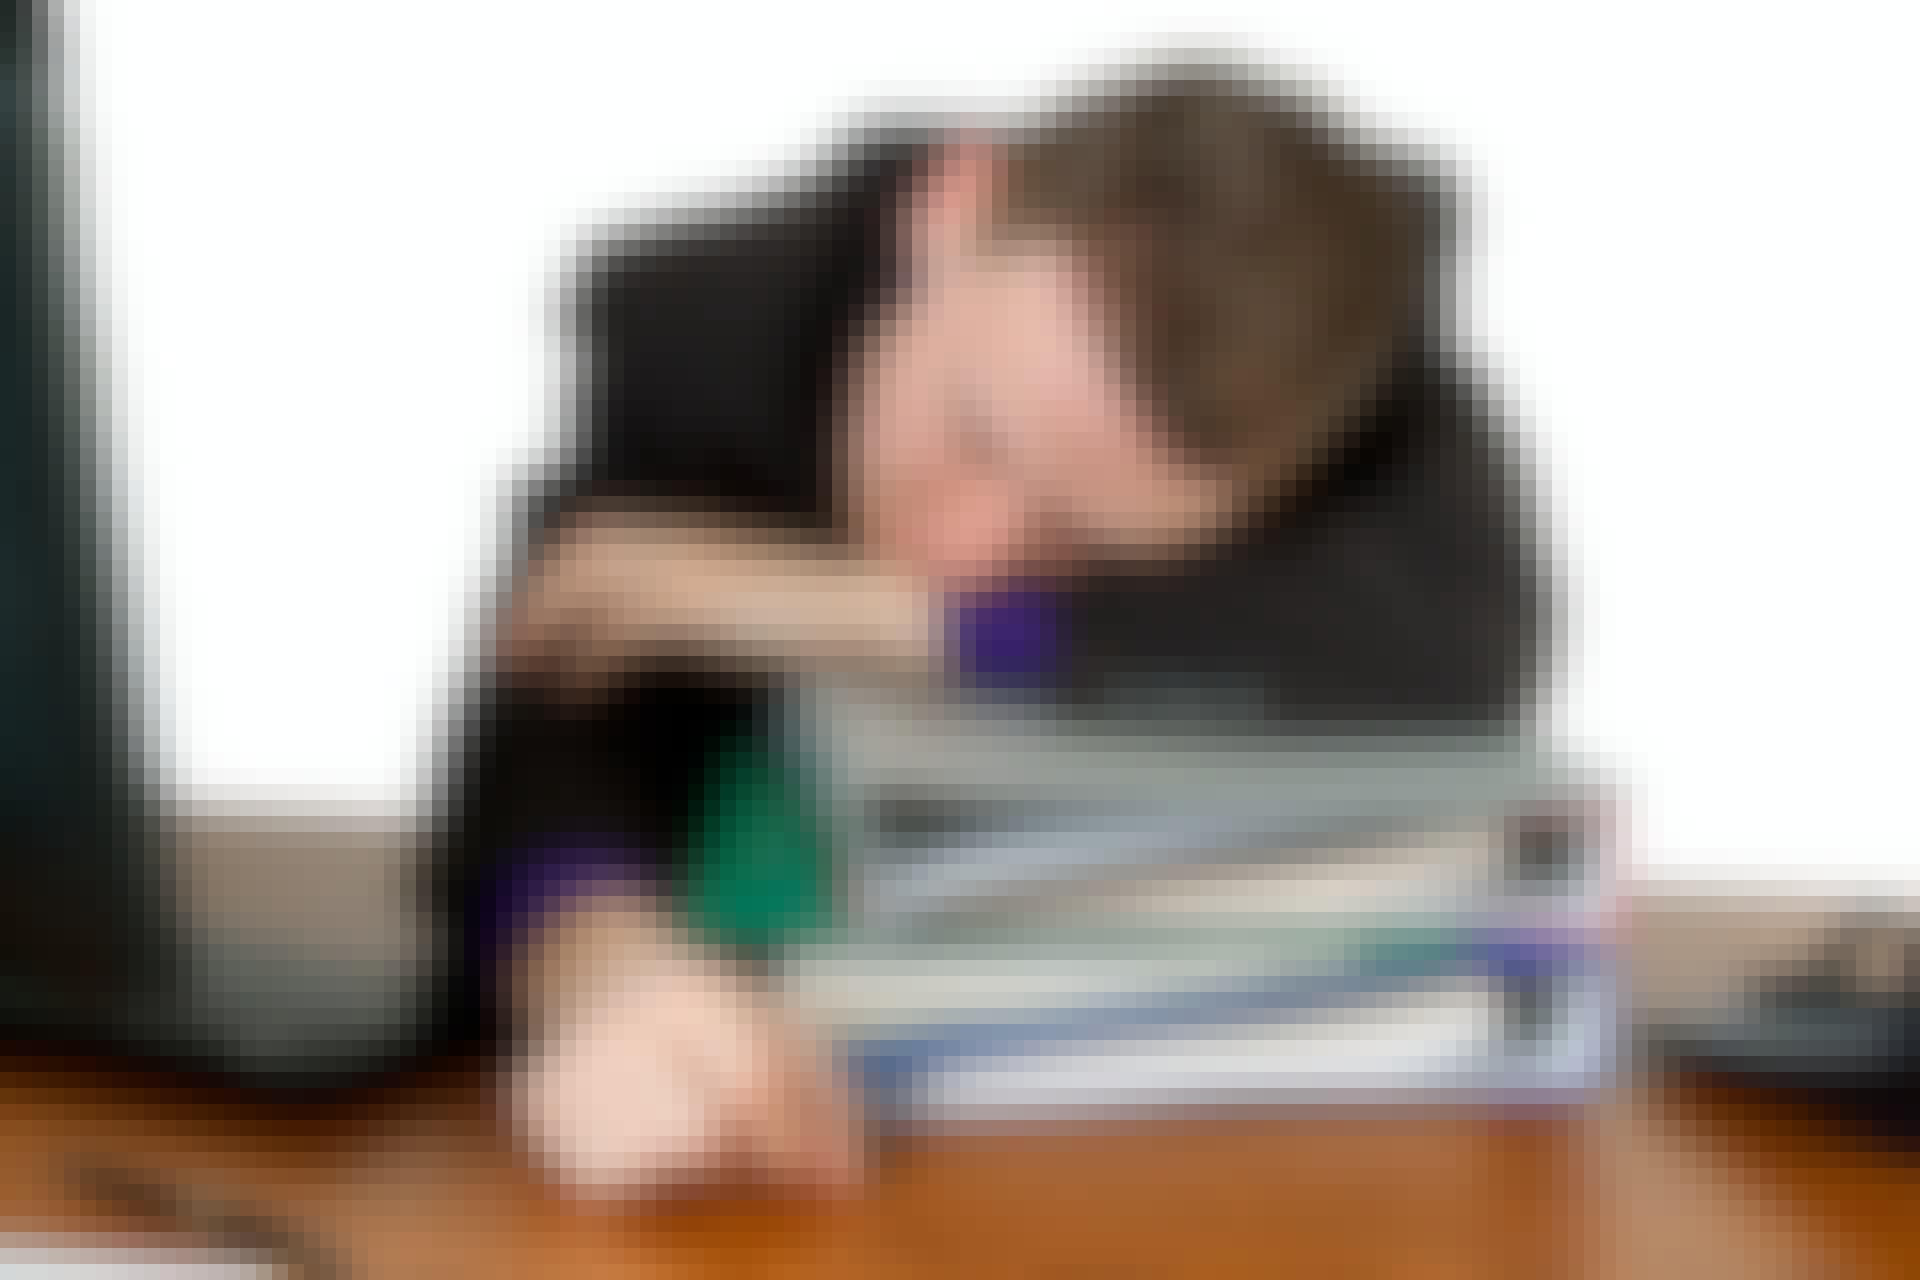 Tired man at work